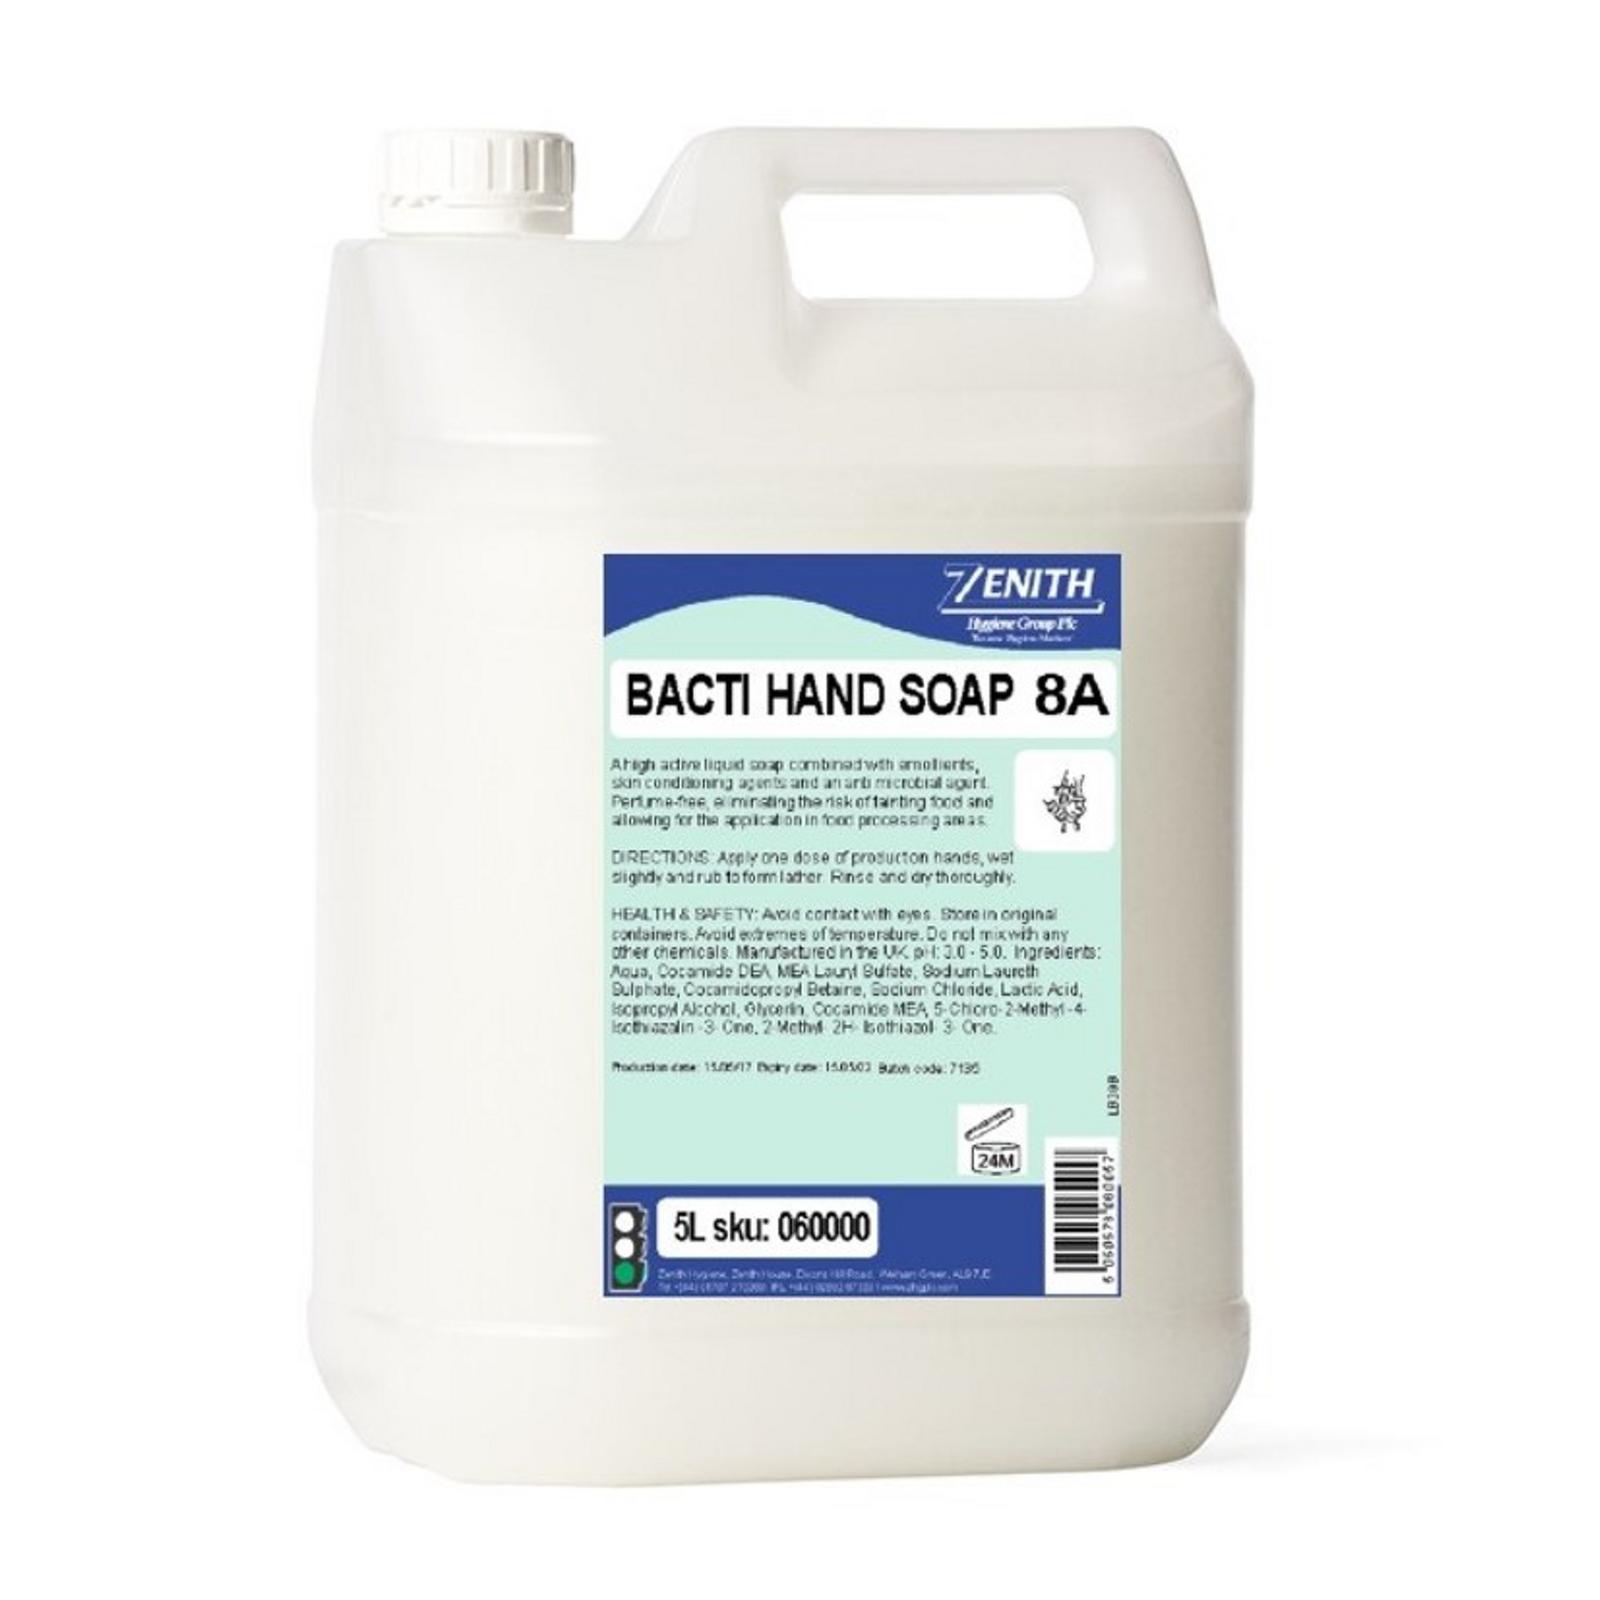 8a Bacti Hand Soap 2x5l